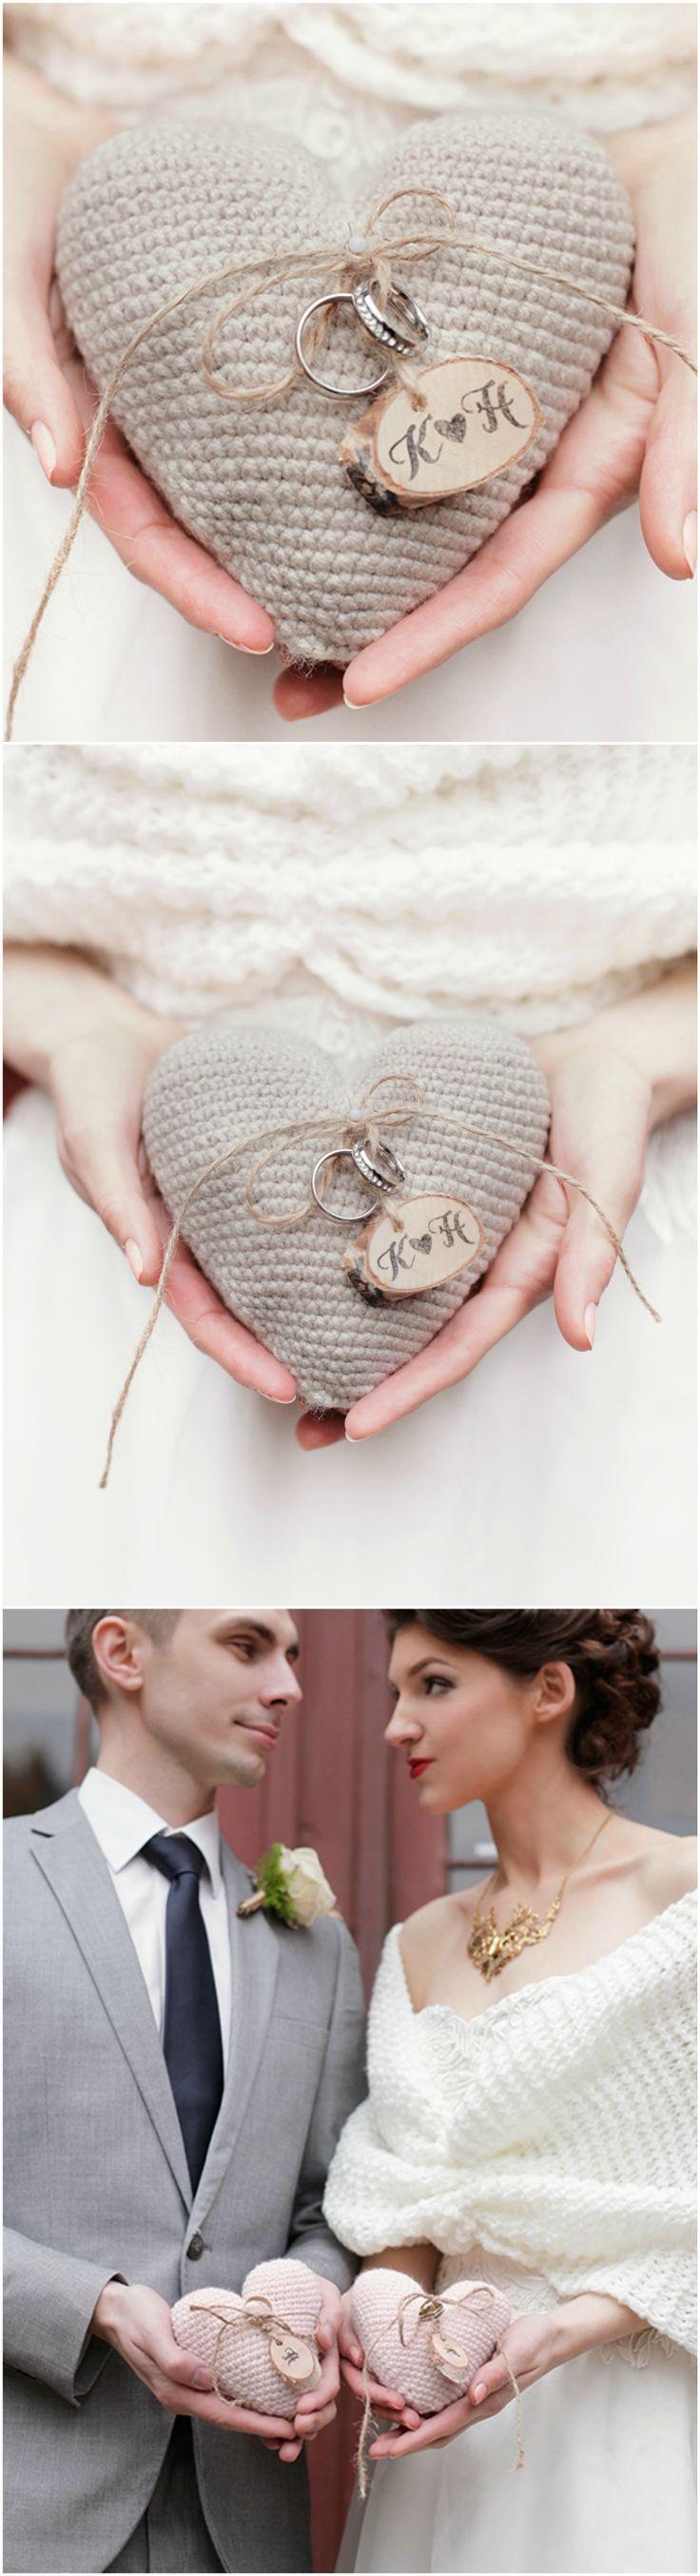 Romantic Shabby Chic Wedding Ring Bearer Pillow with wooden tag #romantic #shabbychic #vintage #rustic #handmade #weddingideas #weddingrings